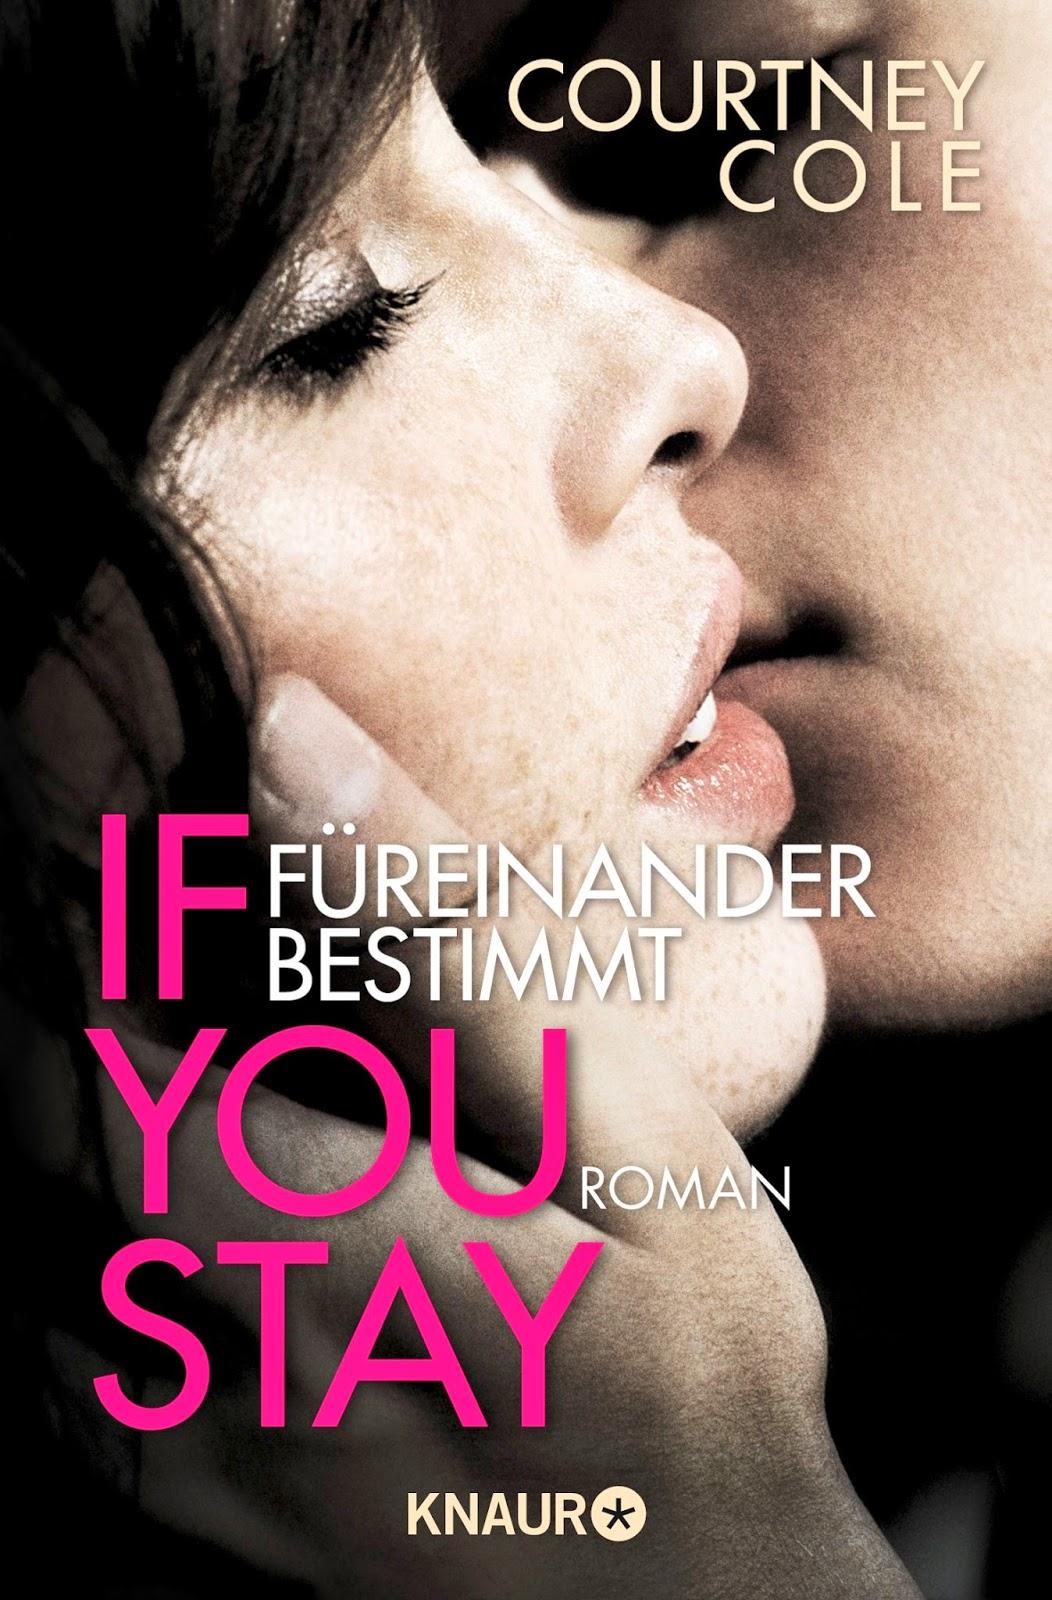 http://www.droemer-knaur.de/buch/7925395/if-you-stay-fuereinander-bestimmt